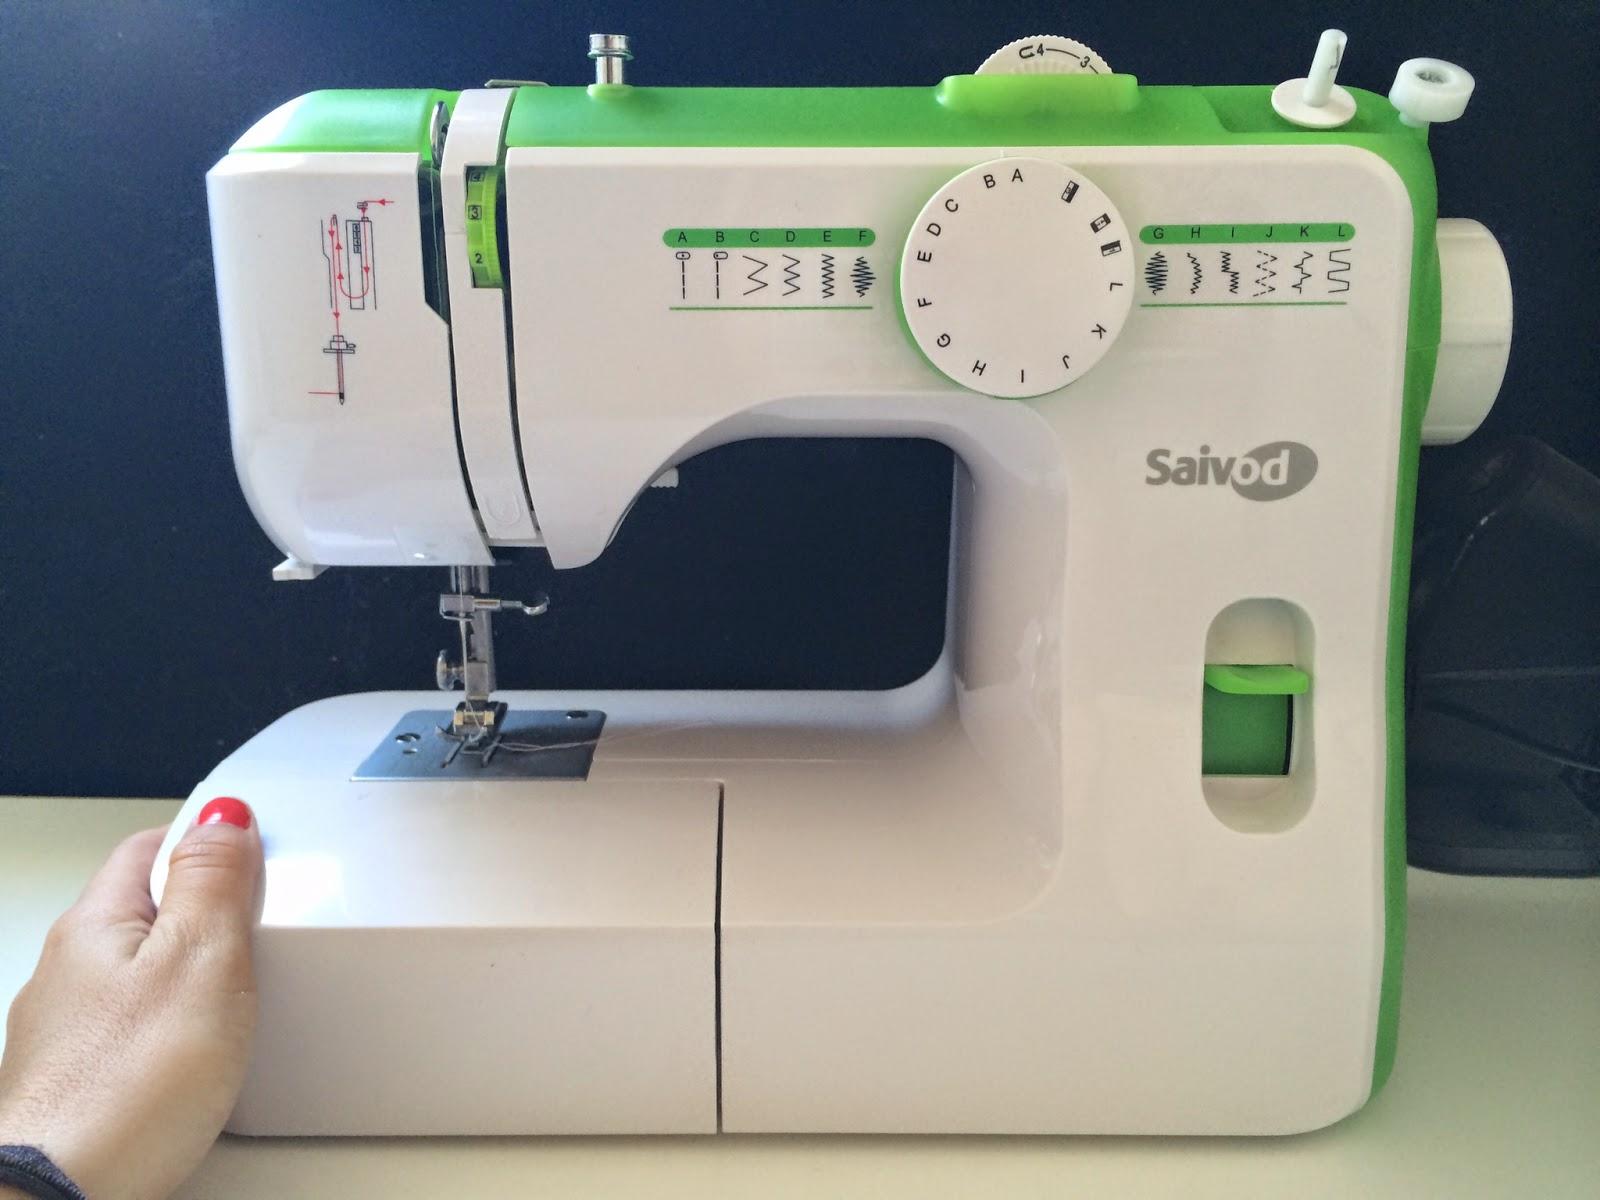 El blog de Lorenna: Máquina de coser para principiantes